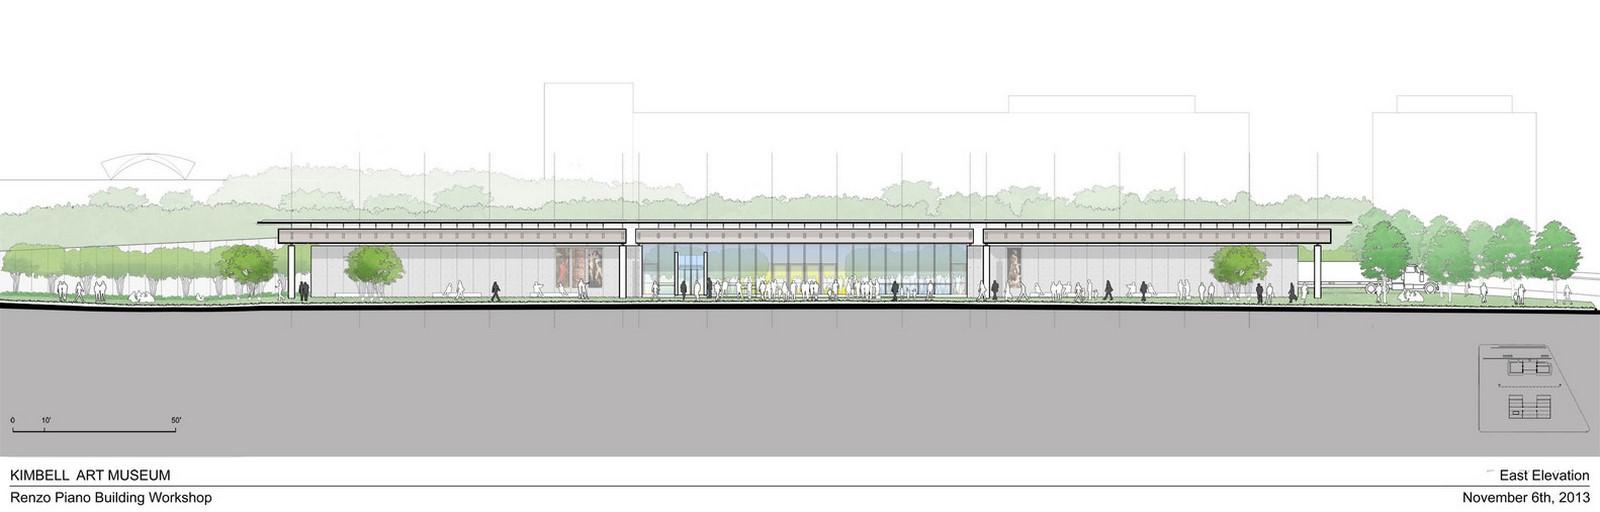 Kimbell Art Museum by Renzo Piano: Mecca of modern architecture - Sheet6